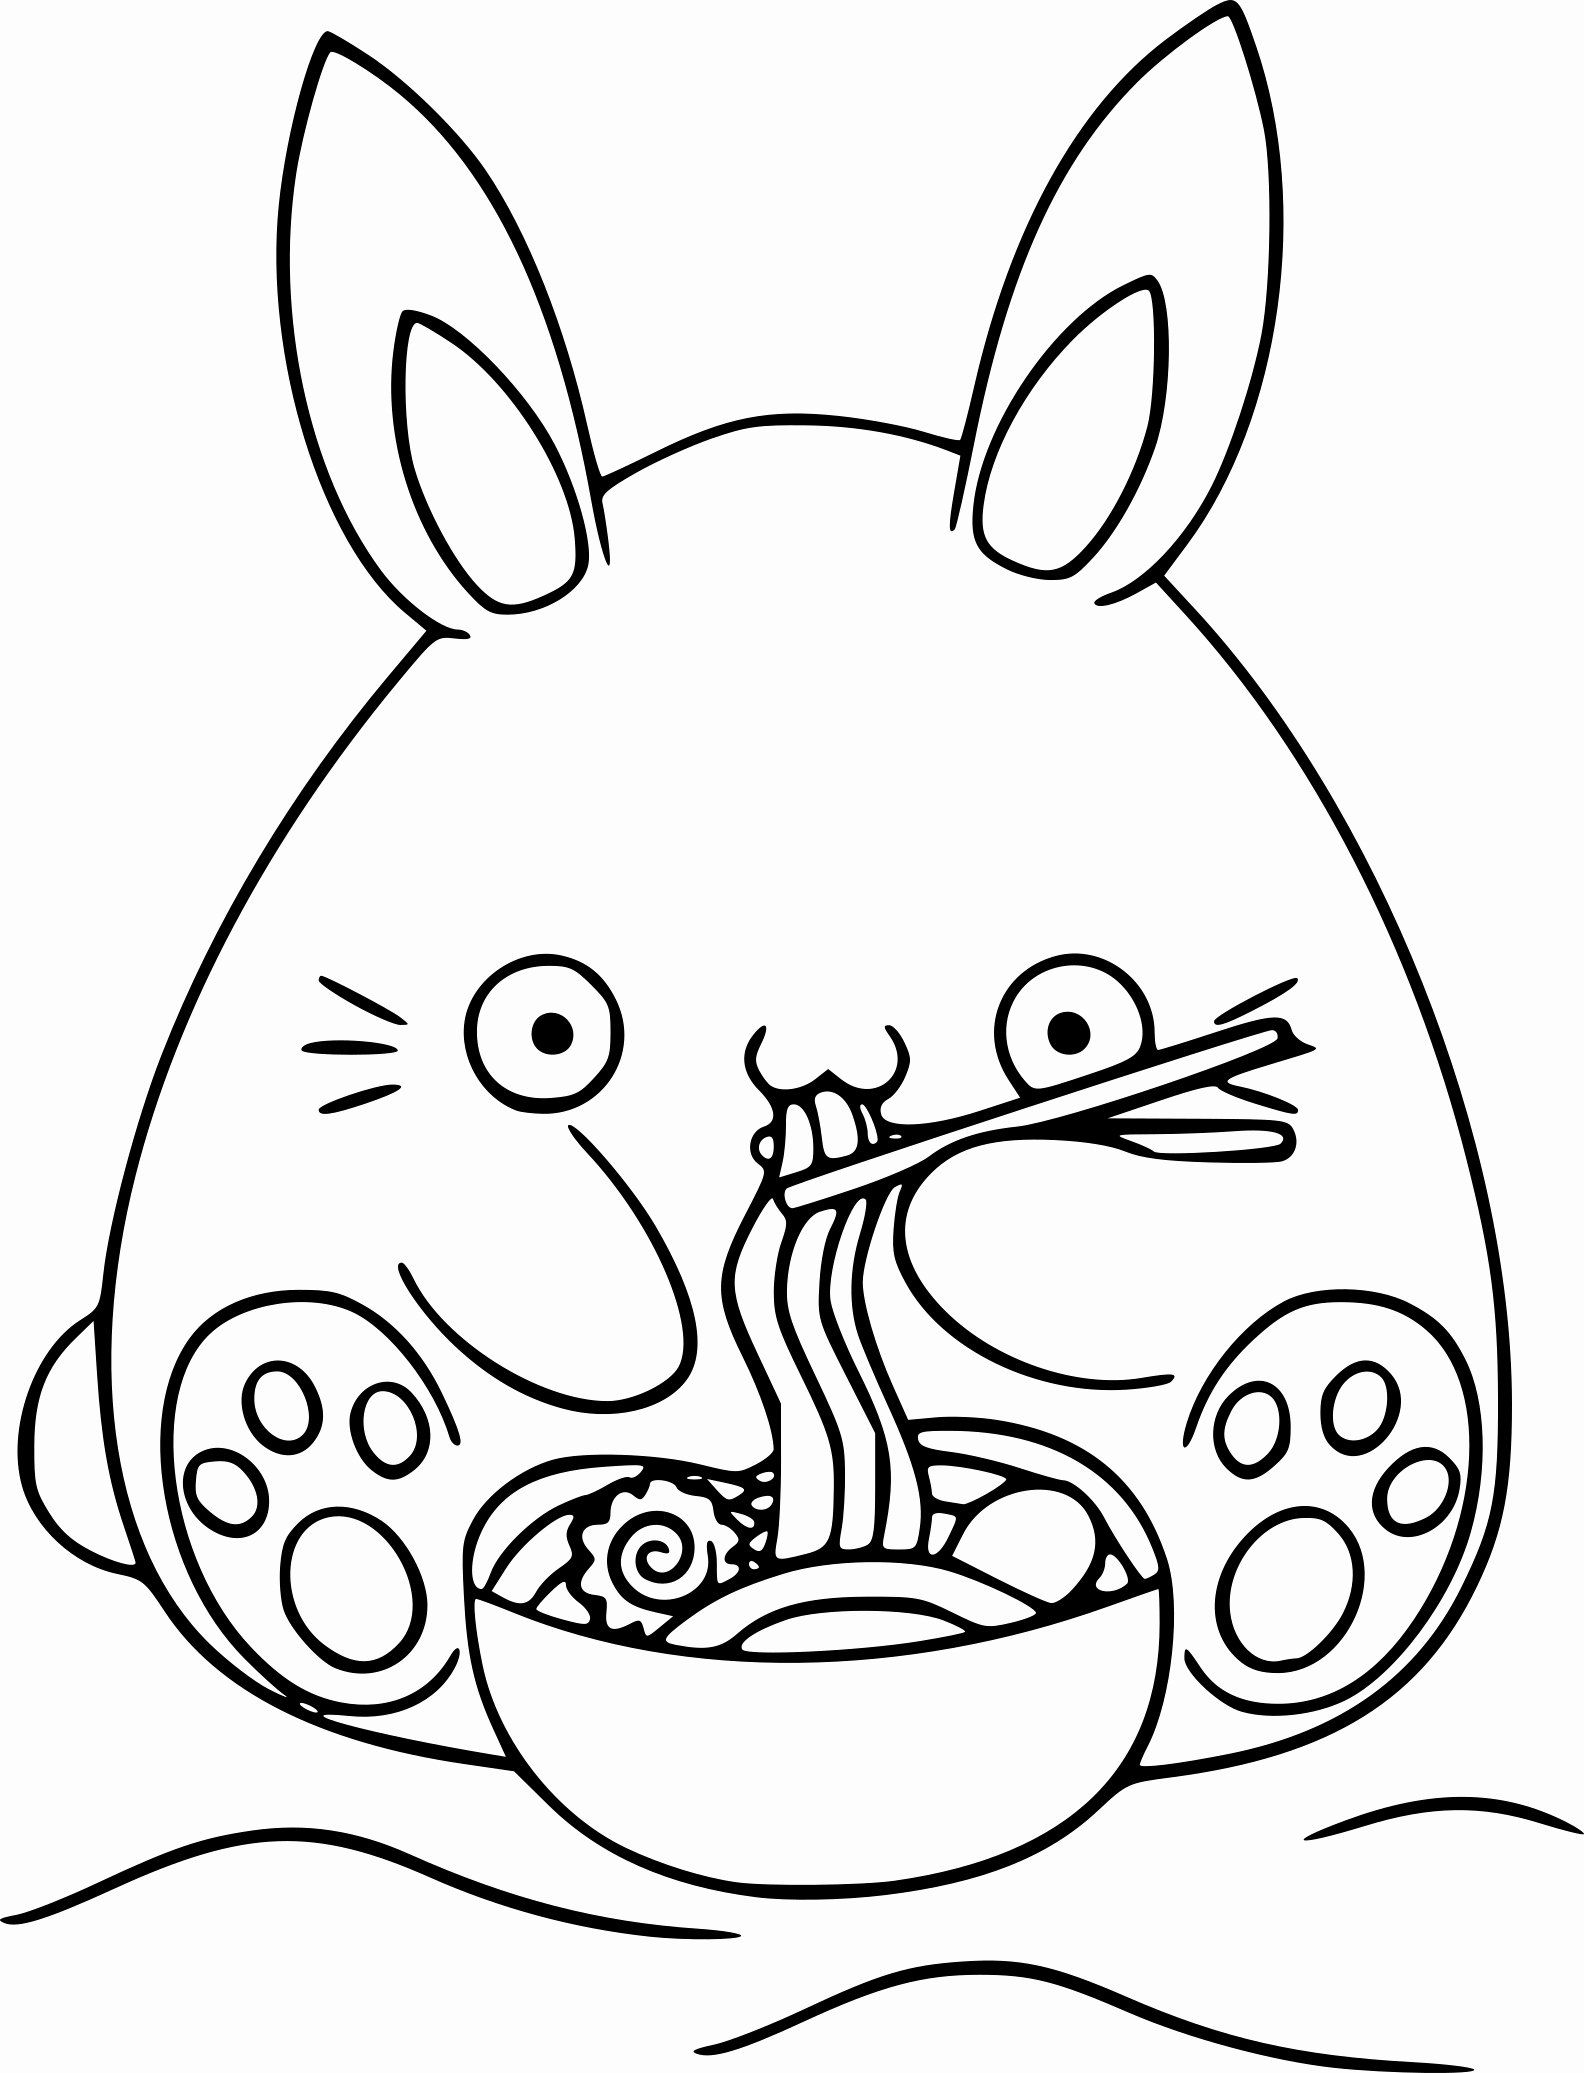 Kawaii Coloring Pages Animals Best Of 40 Kawaii Coloring Pages Coloringstar Bunny Coloring Pages Unicorn Coloring Pages Animal Coloring Pages